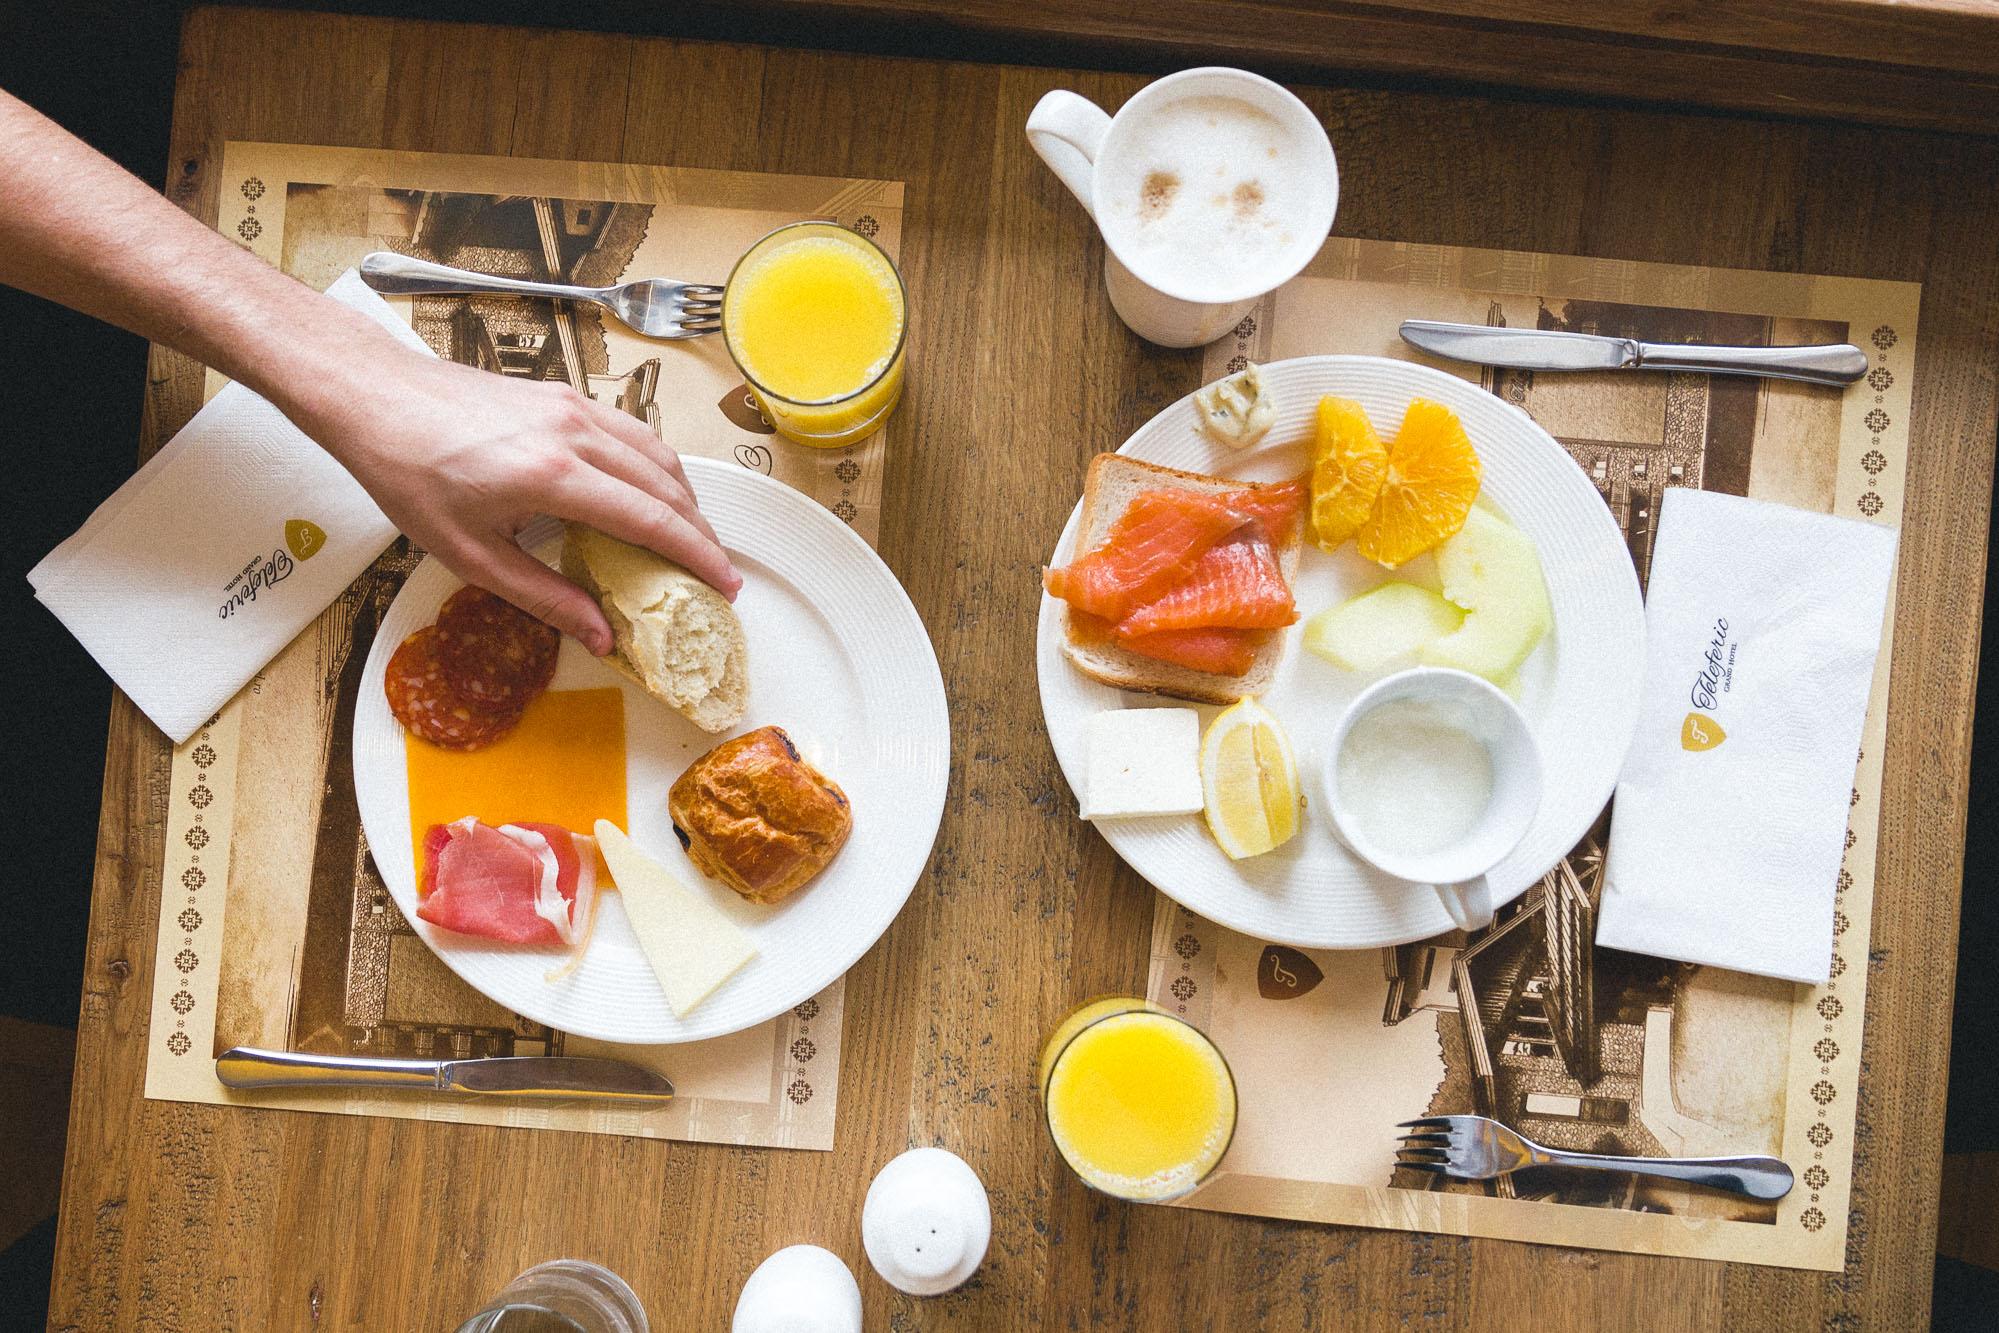 Breakfast in Romania via Find Us Lost